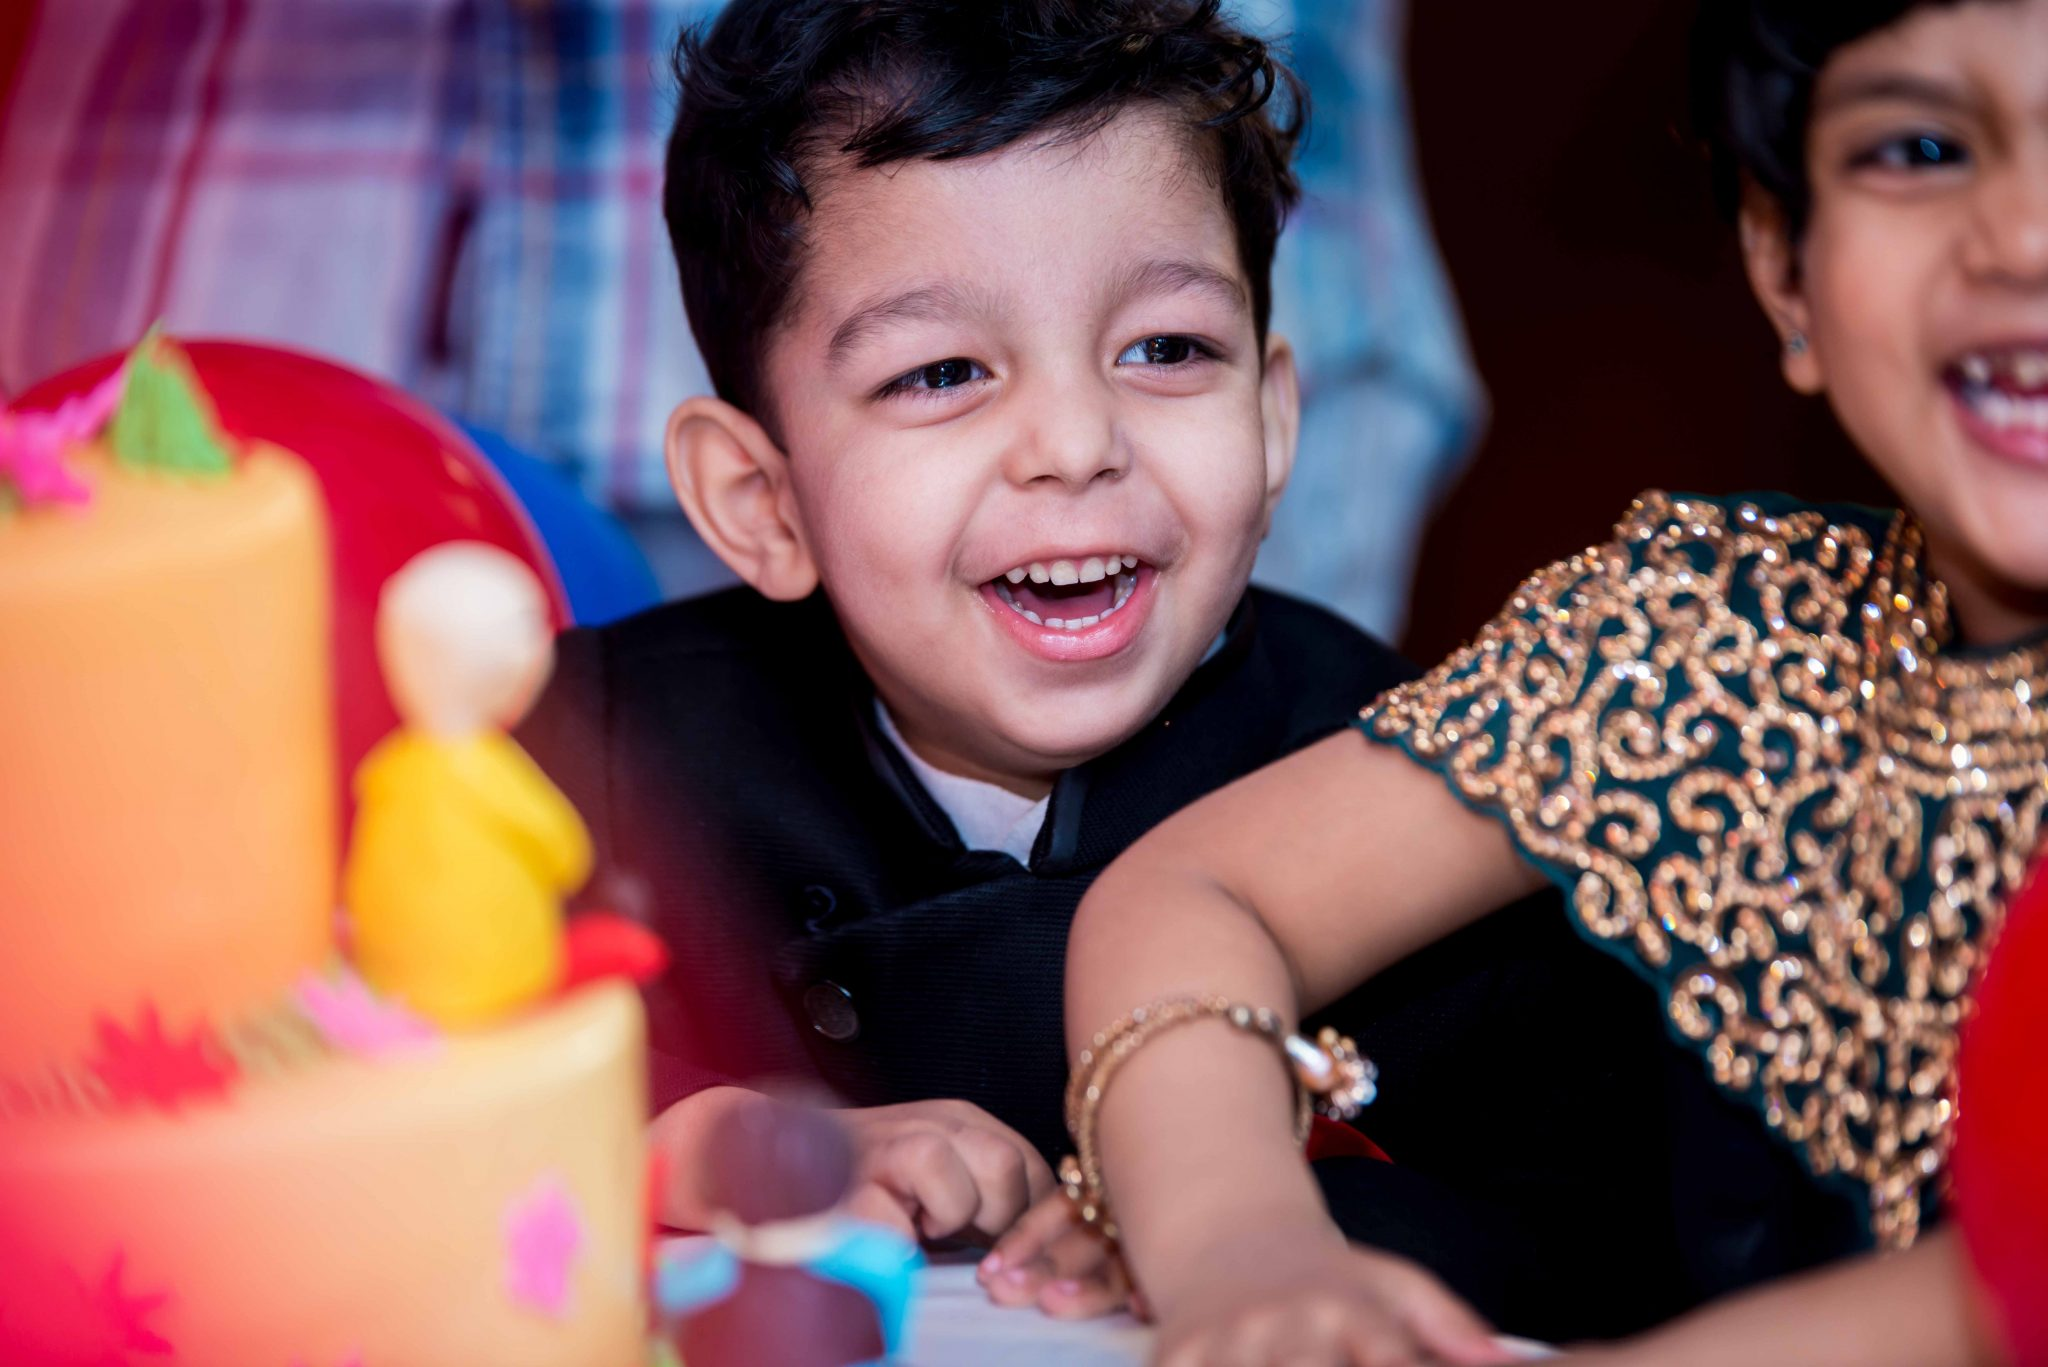 birthday photoshoot birthday photography first birthday photography digiart photography 9298051870